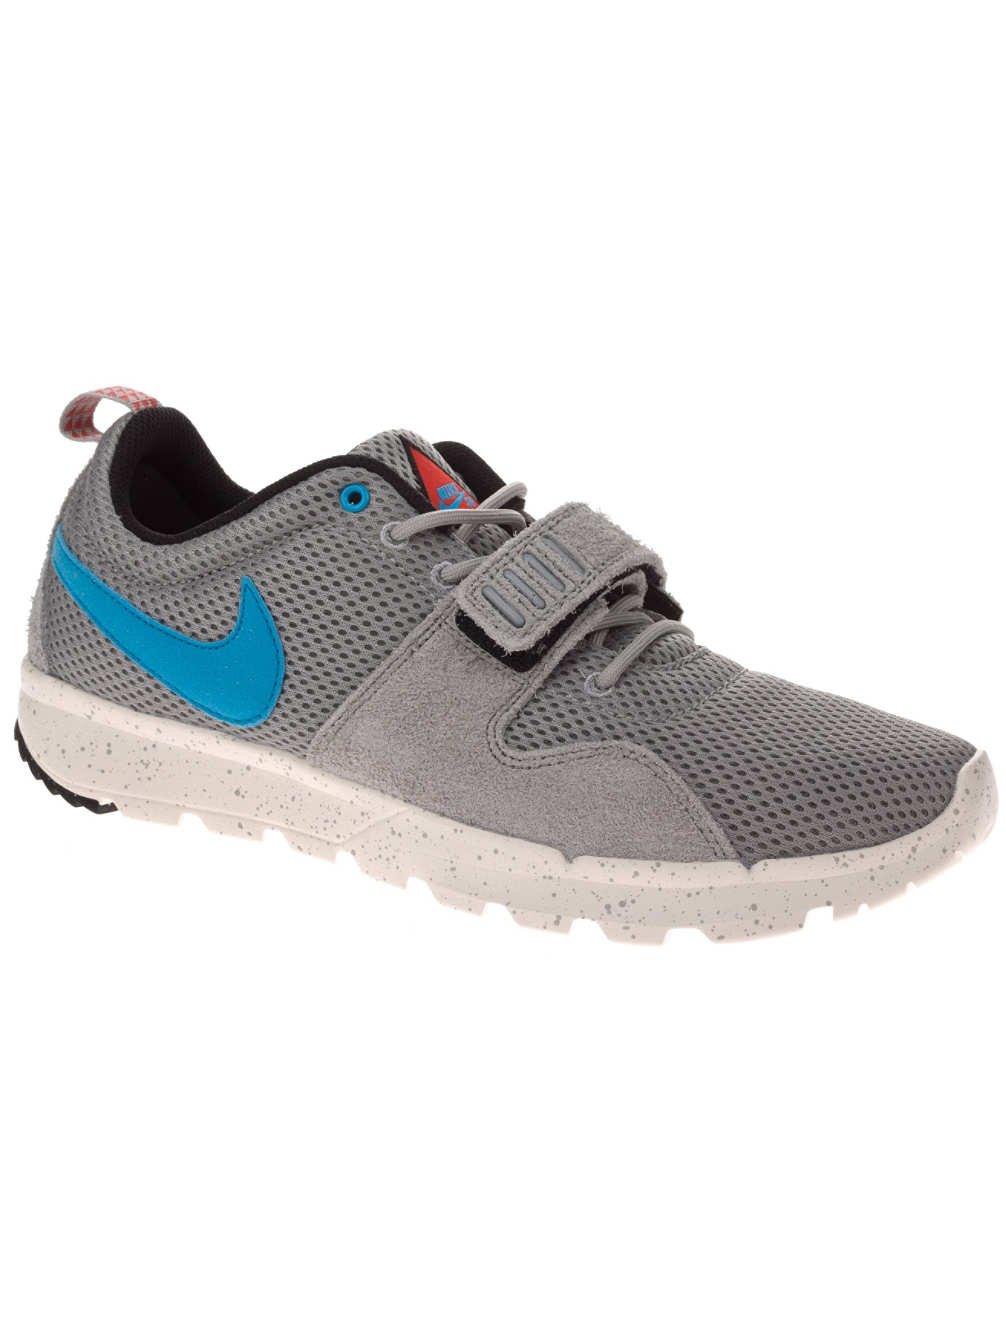 Nike-SB-Trainerendor-Mens-Fashion-Shoes-Base-Grey-